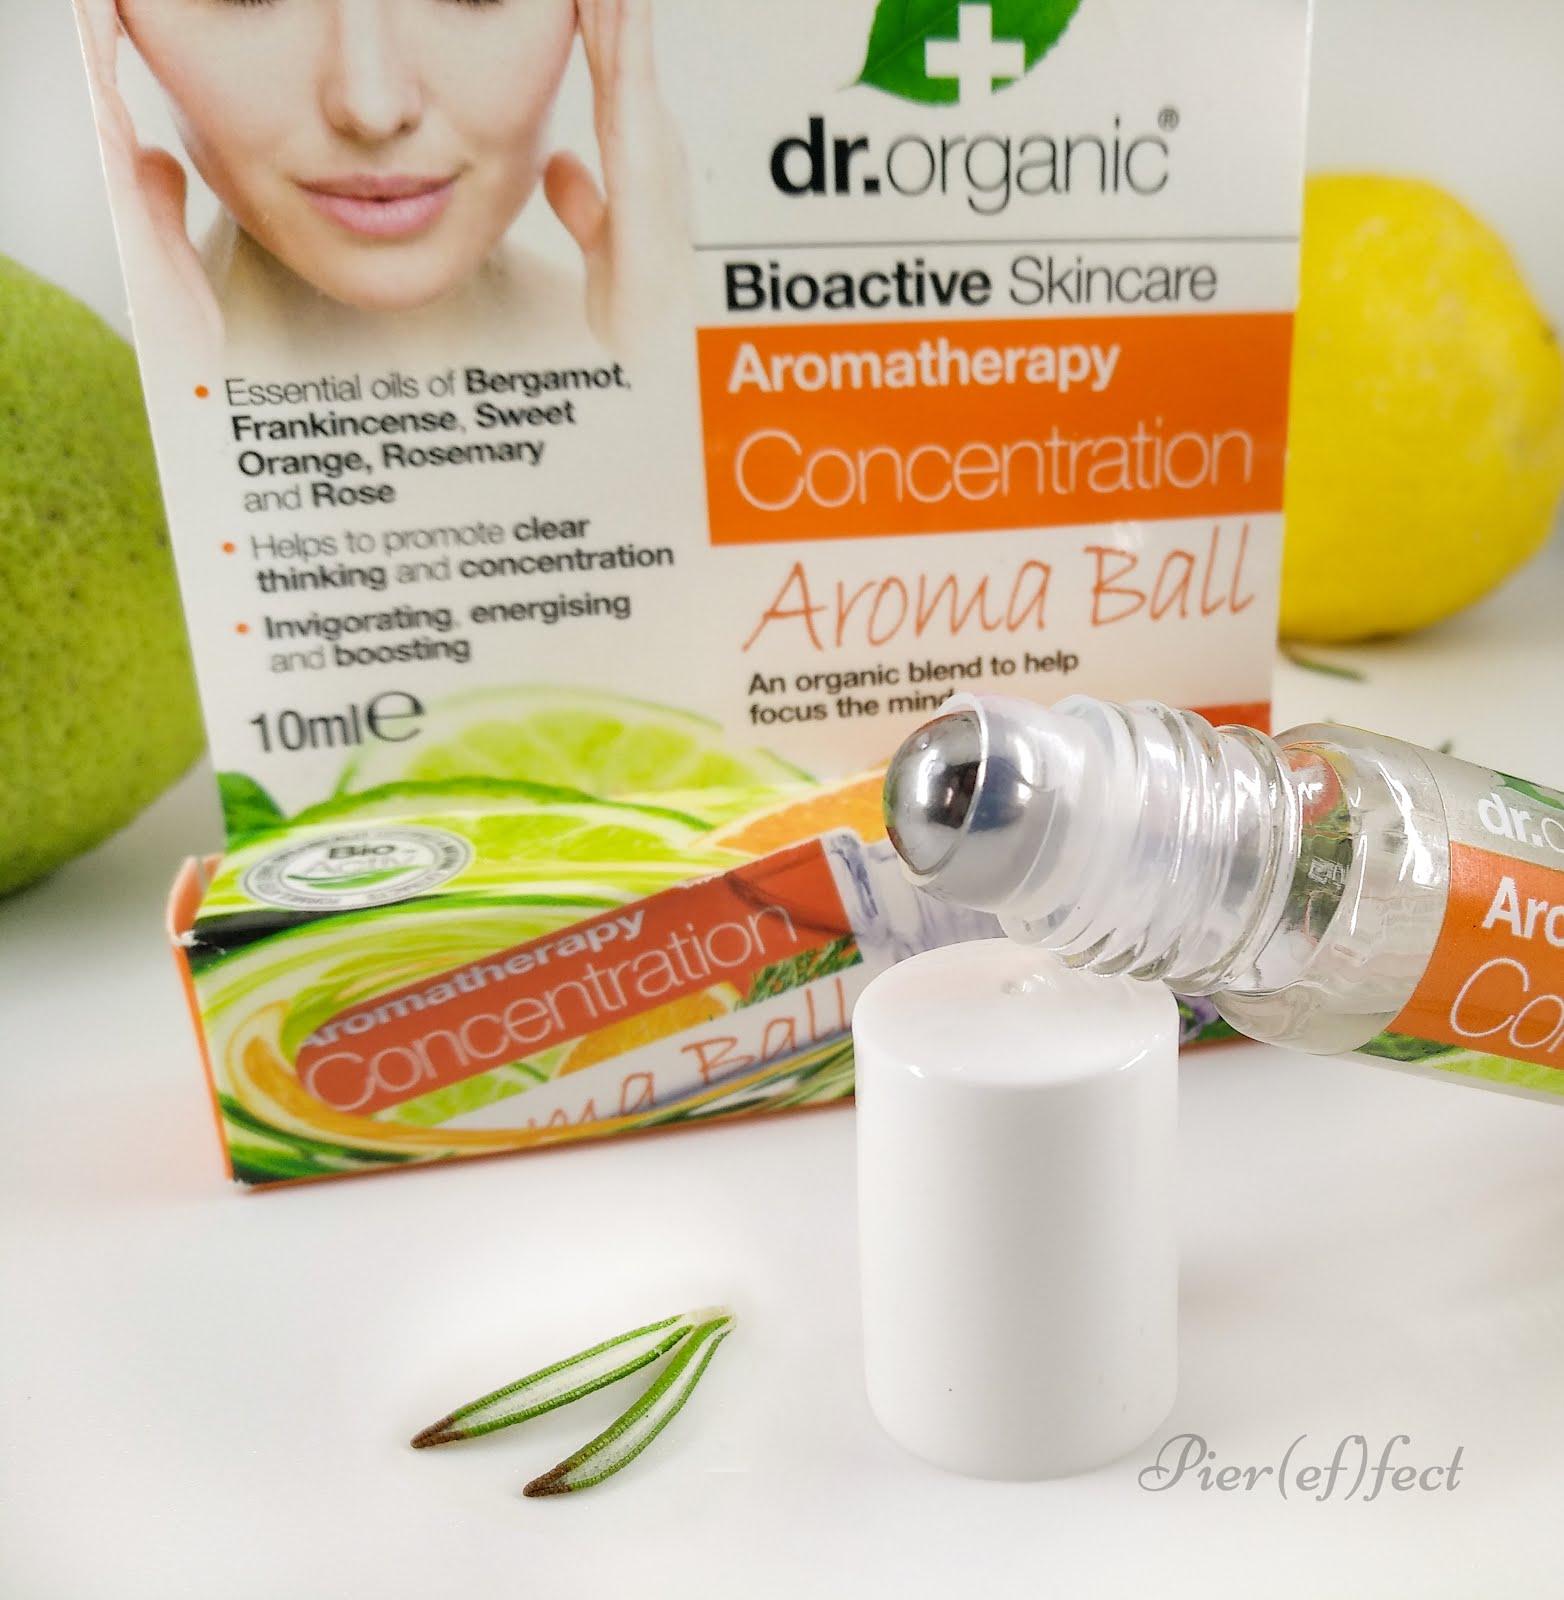 opinioni dr organic aroma ball